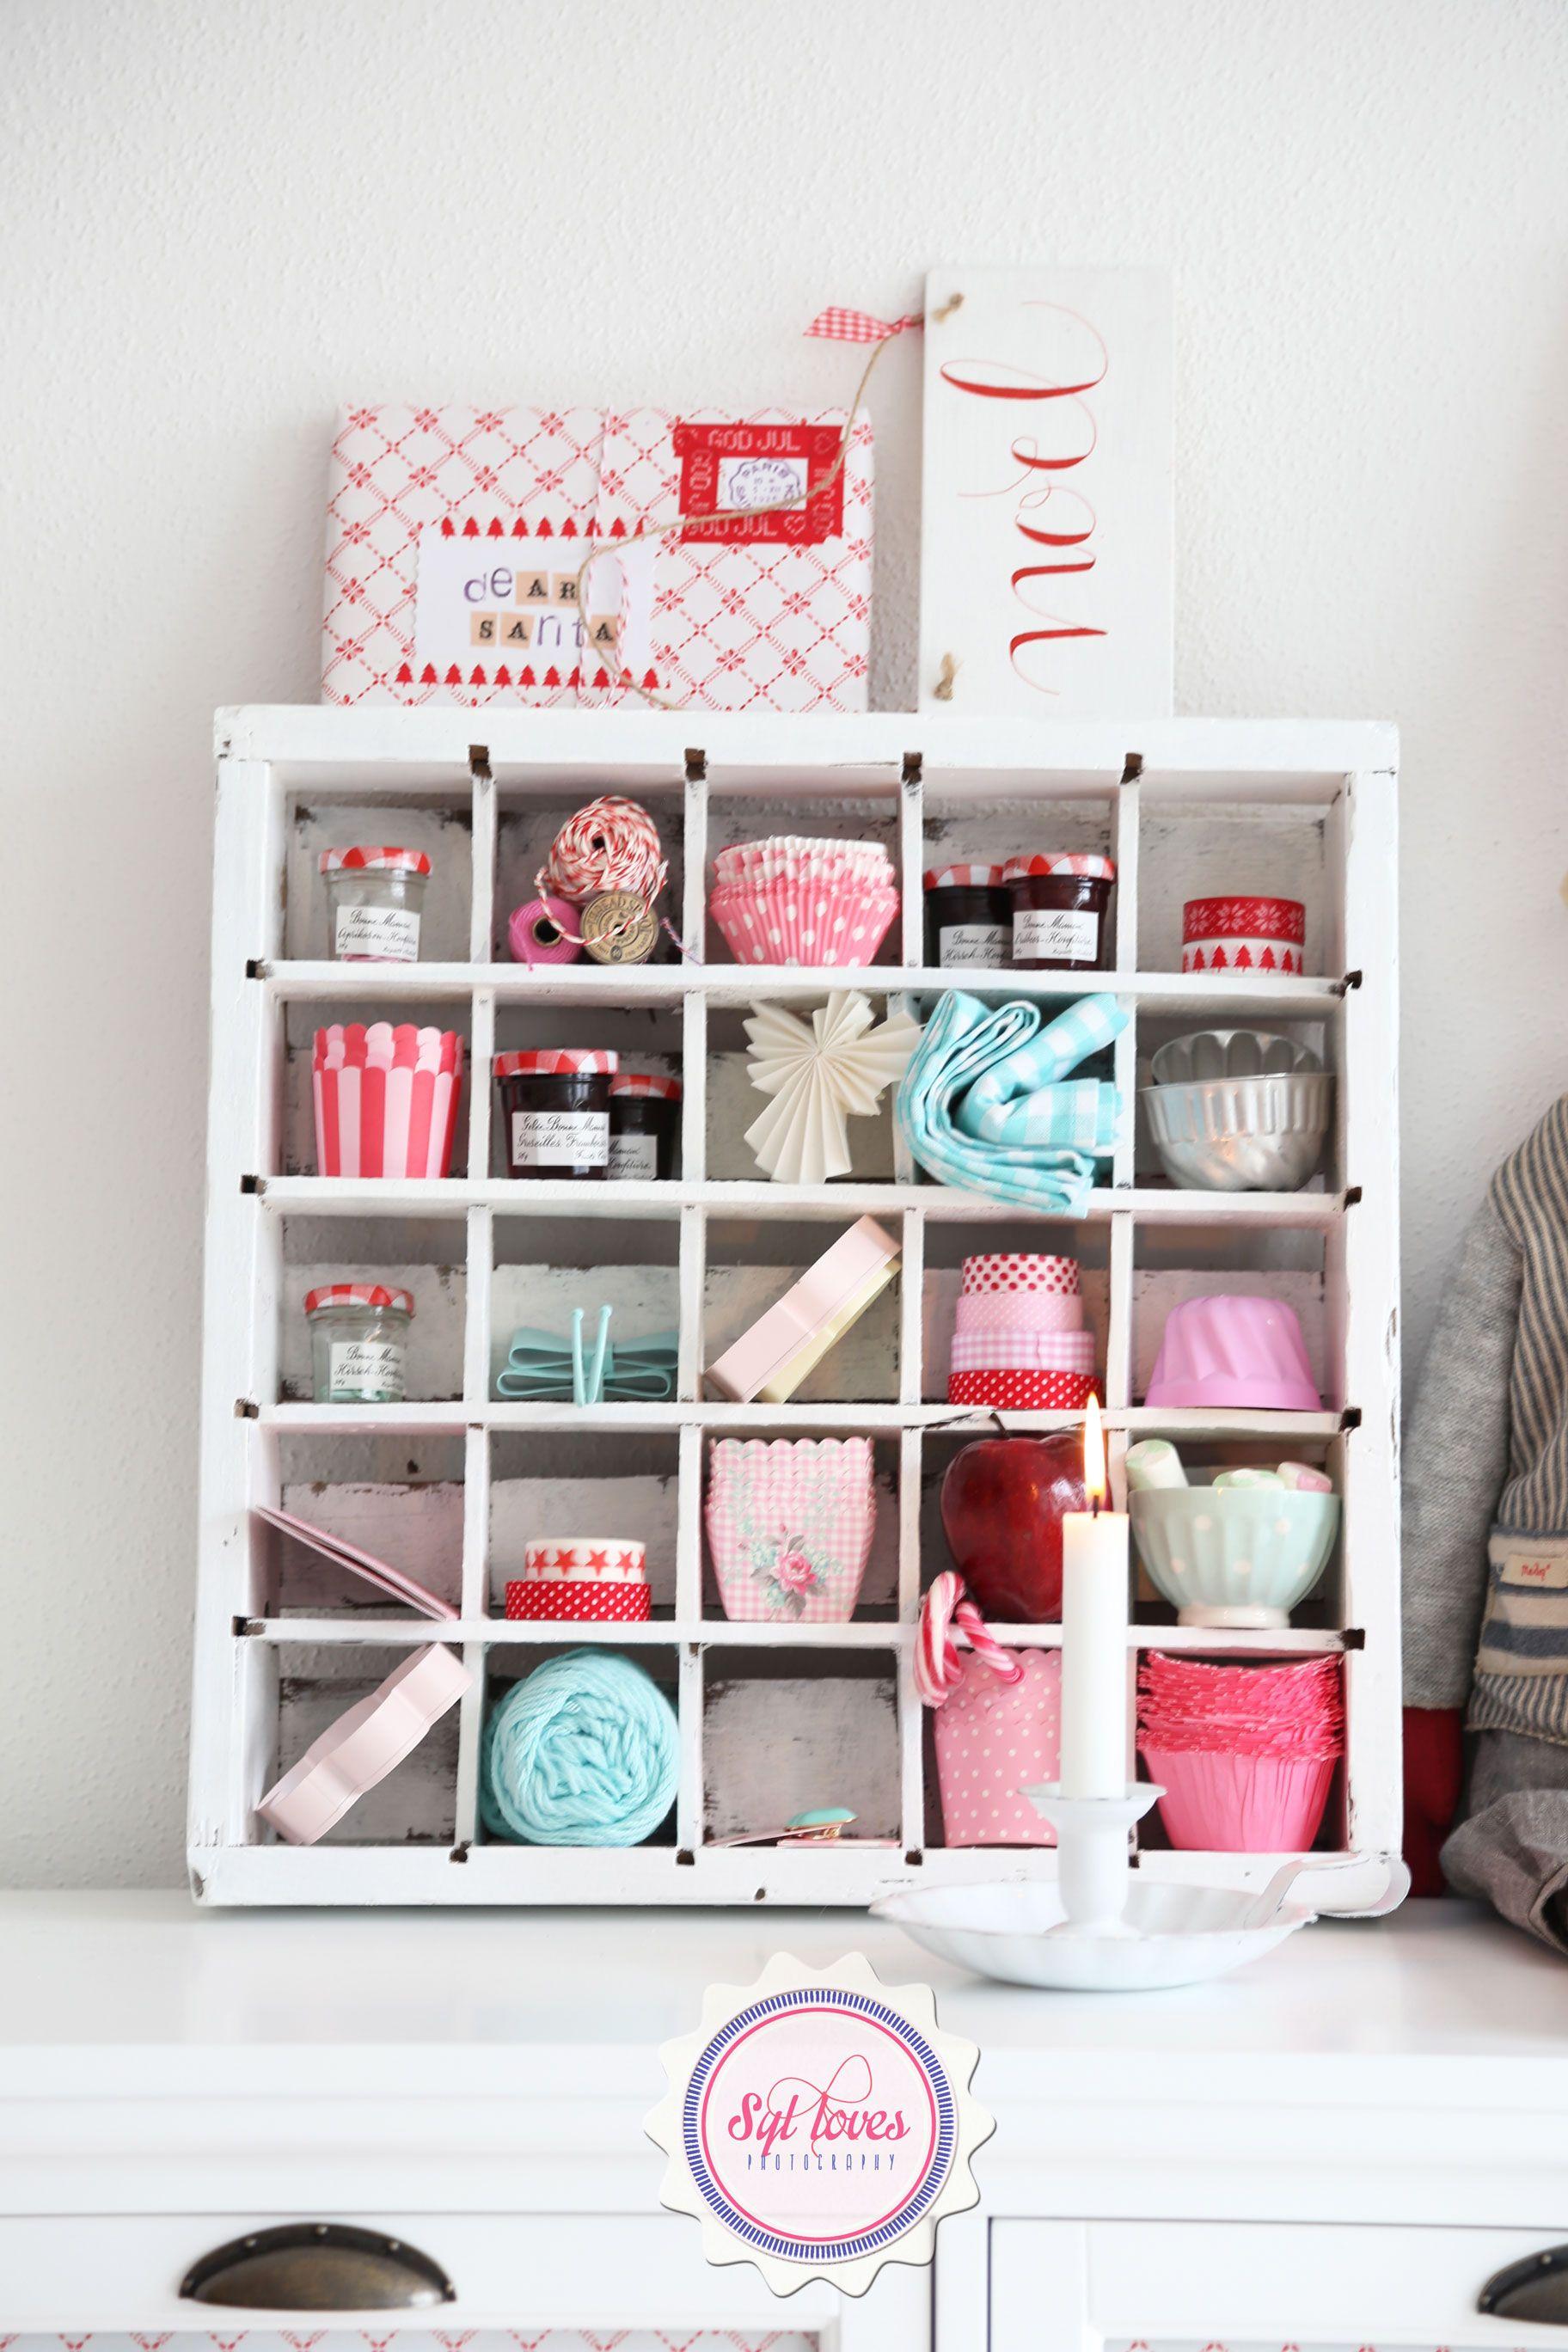 Syl loves, xmas, Ib Laursen, Maileg, vintage, red, mint, pink, white ...